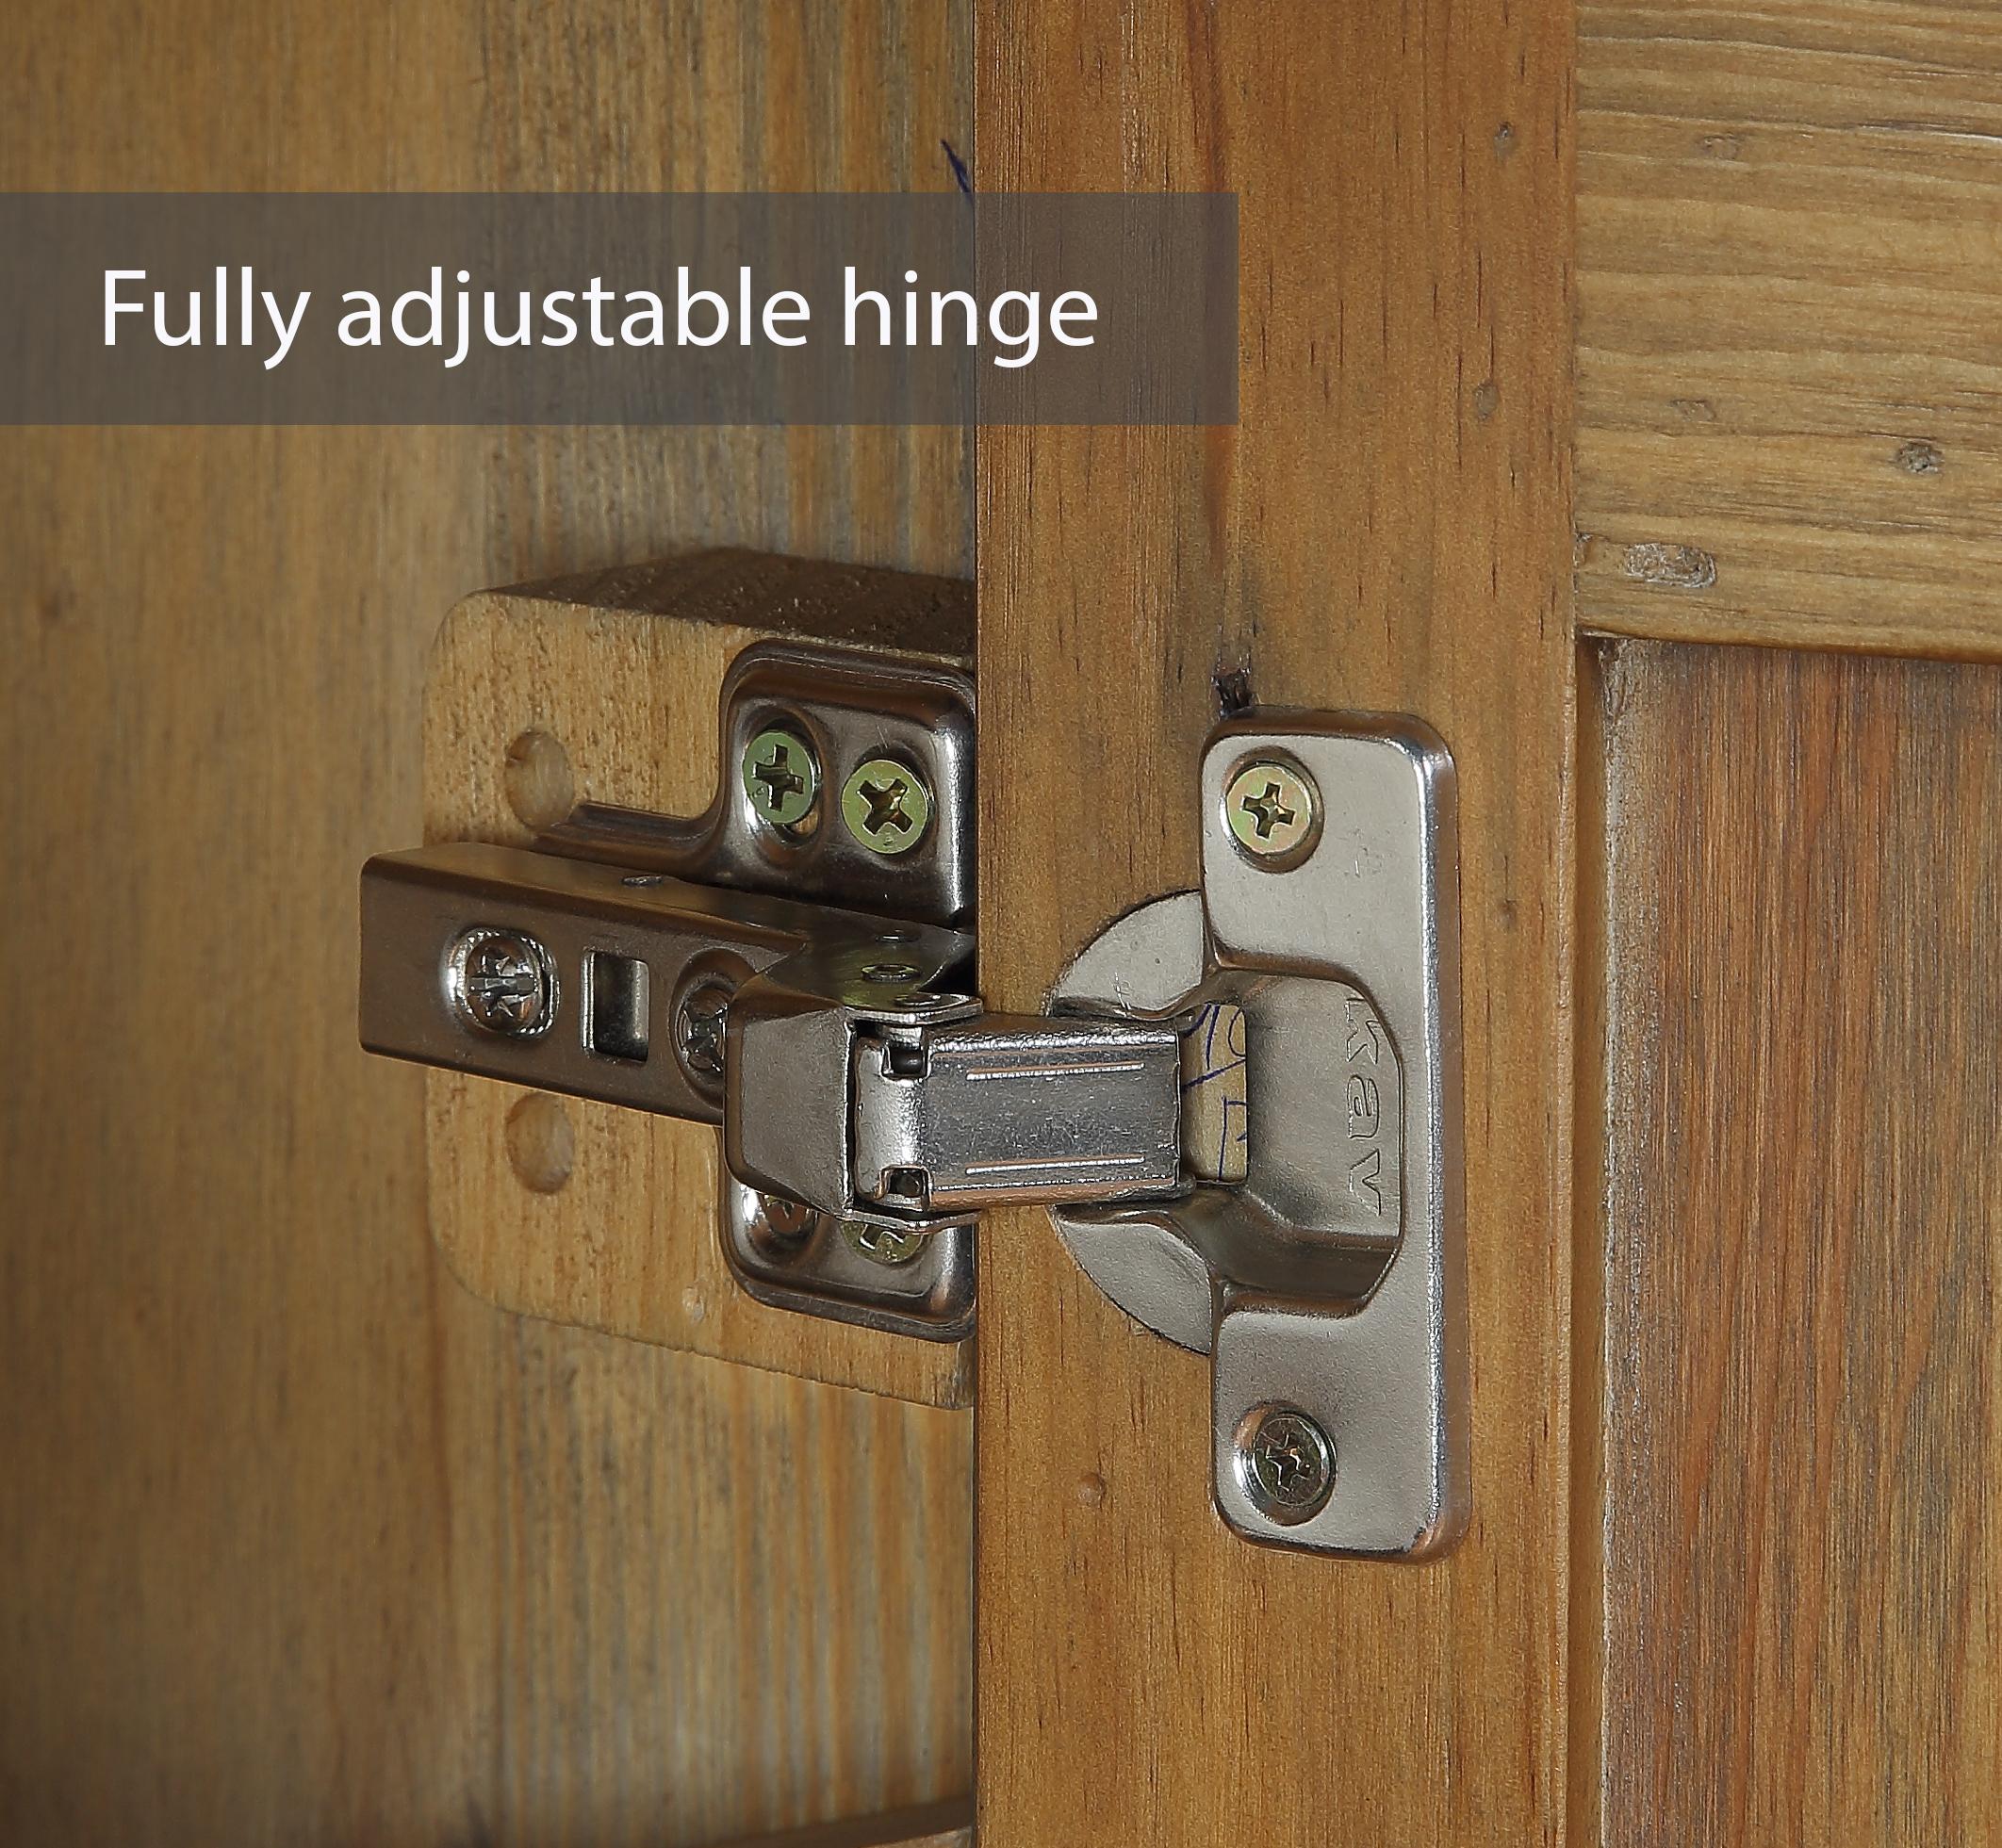 a fully adjustable door hinge